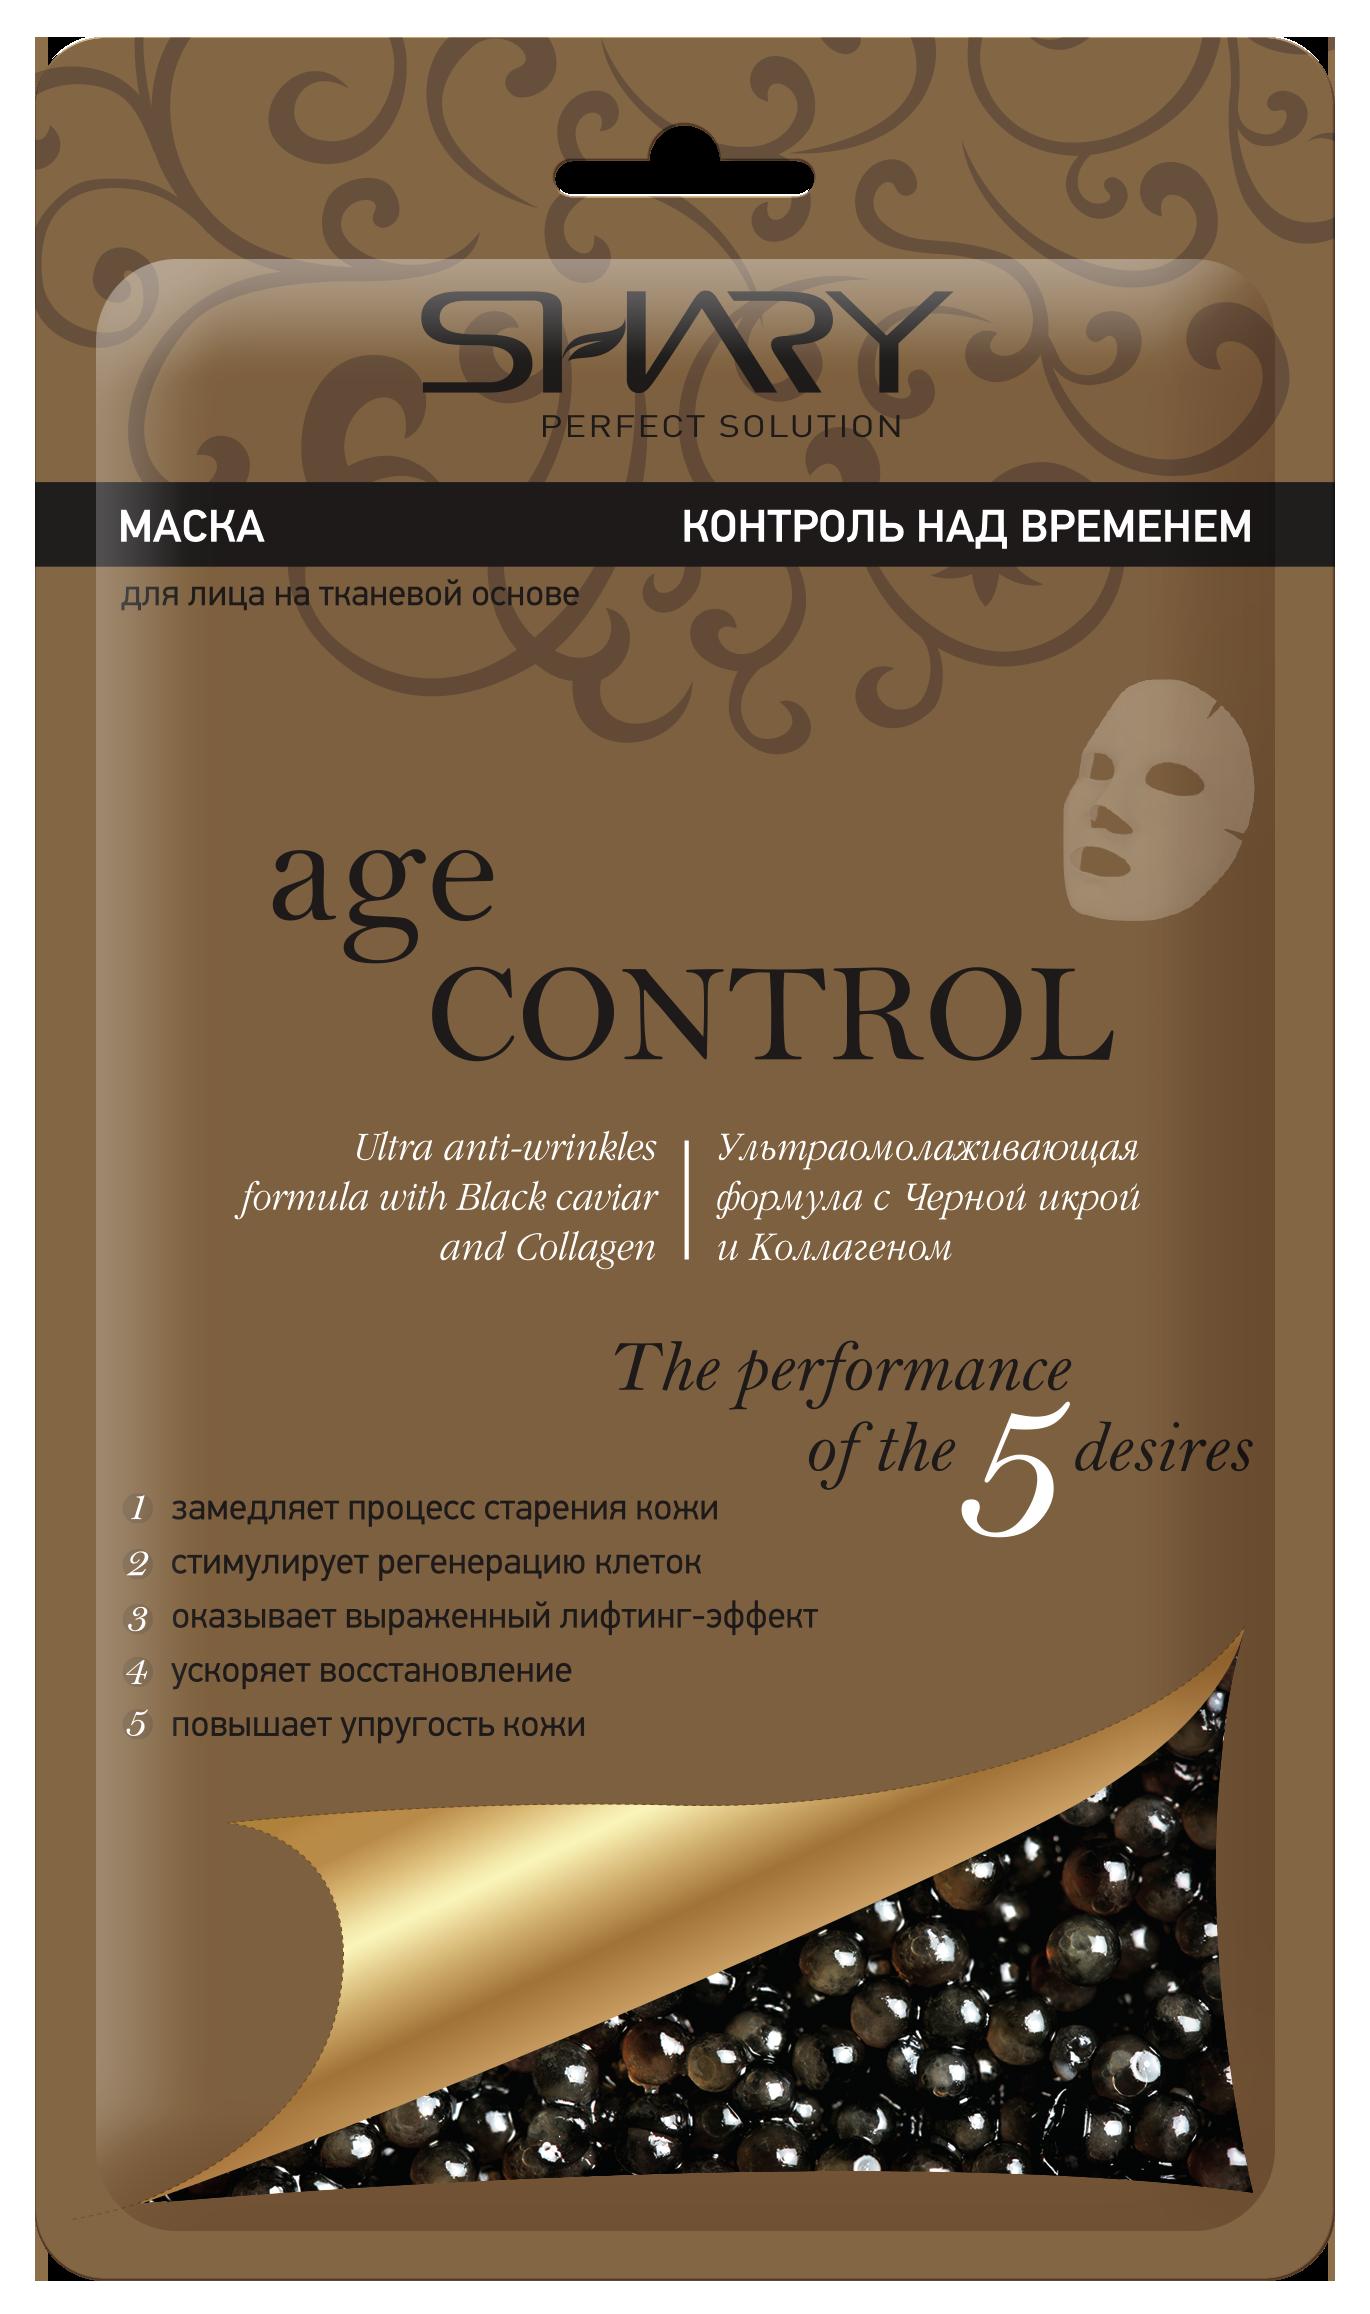 SHARY Маска для лица на тканевой основе Контроль над временем Черная икра и коллаген / SHARY 20 гр